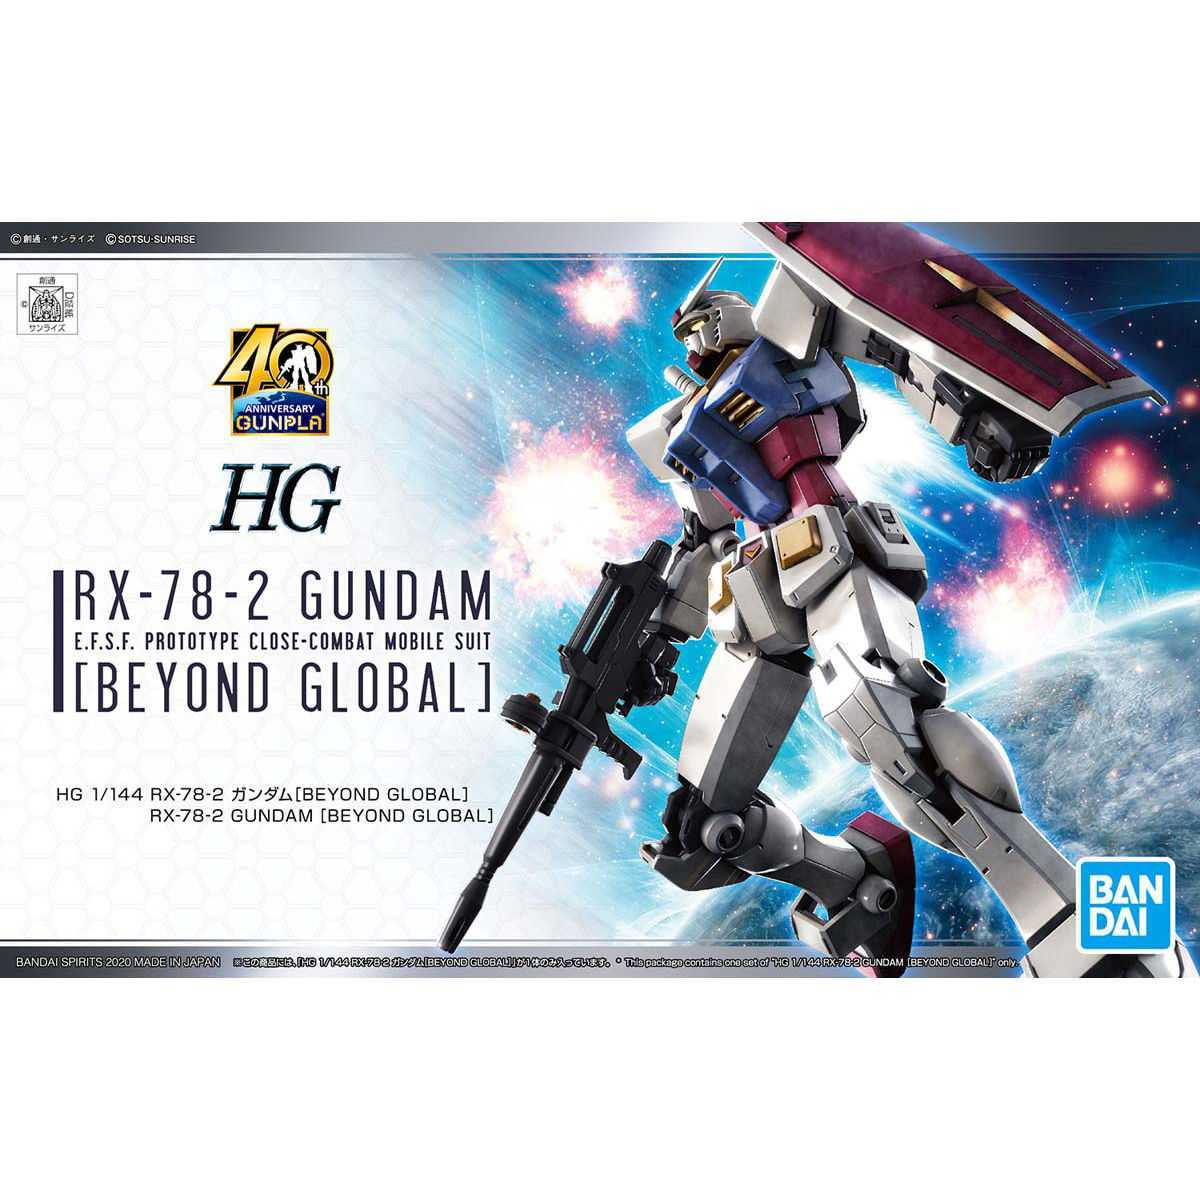 HG 1/144 RX-78-2 ガンダム [BEYOND GLOBAL] 大河原邦男_画像5